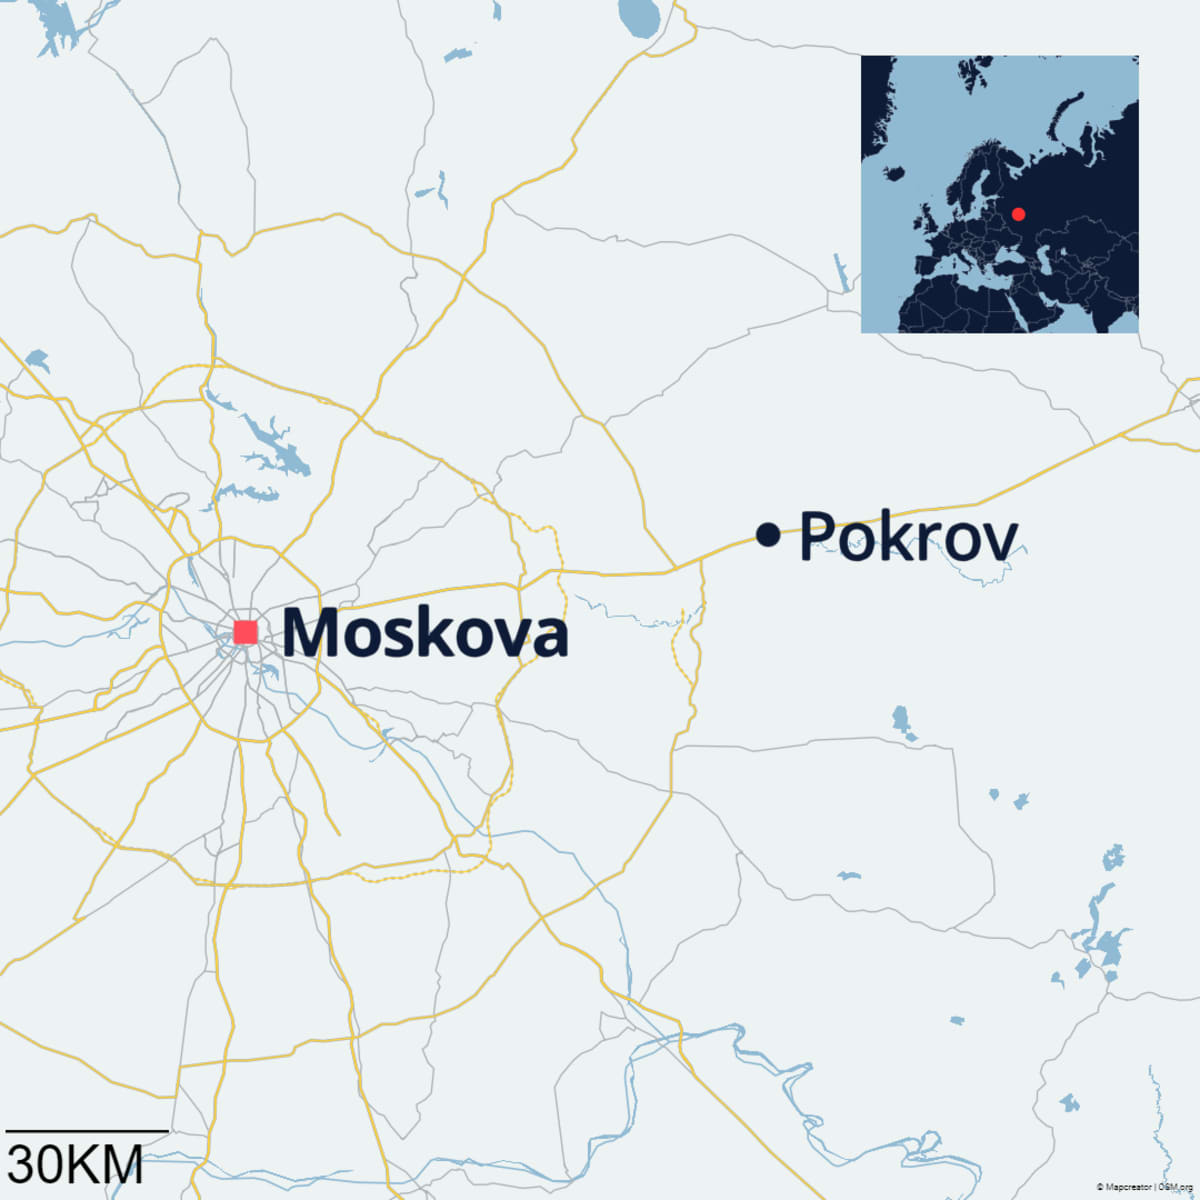 Pokrov ja Moskova kartalla